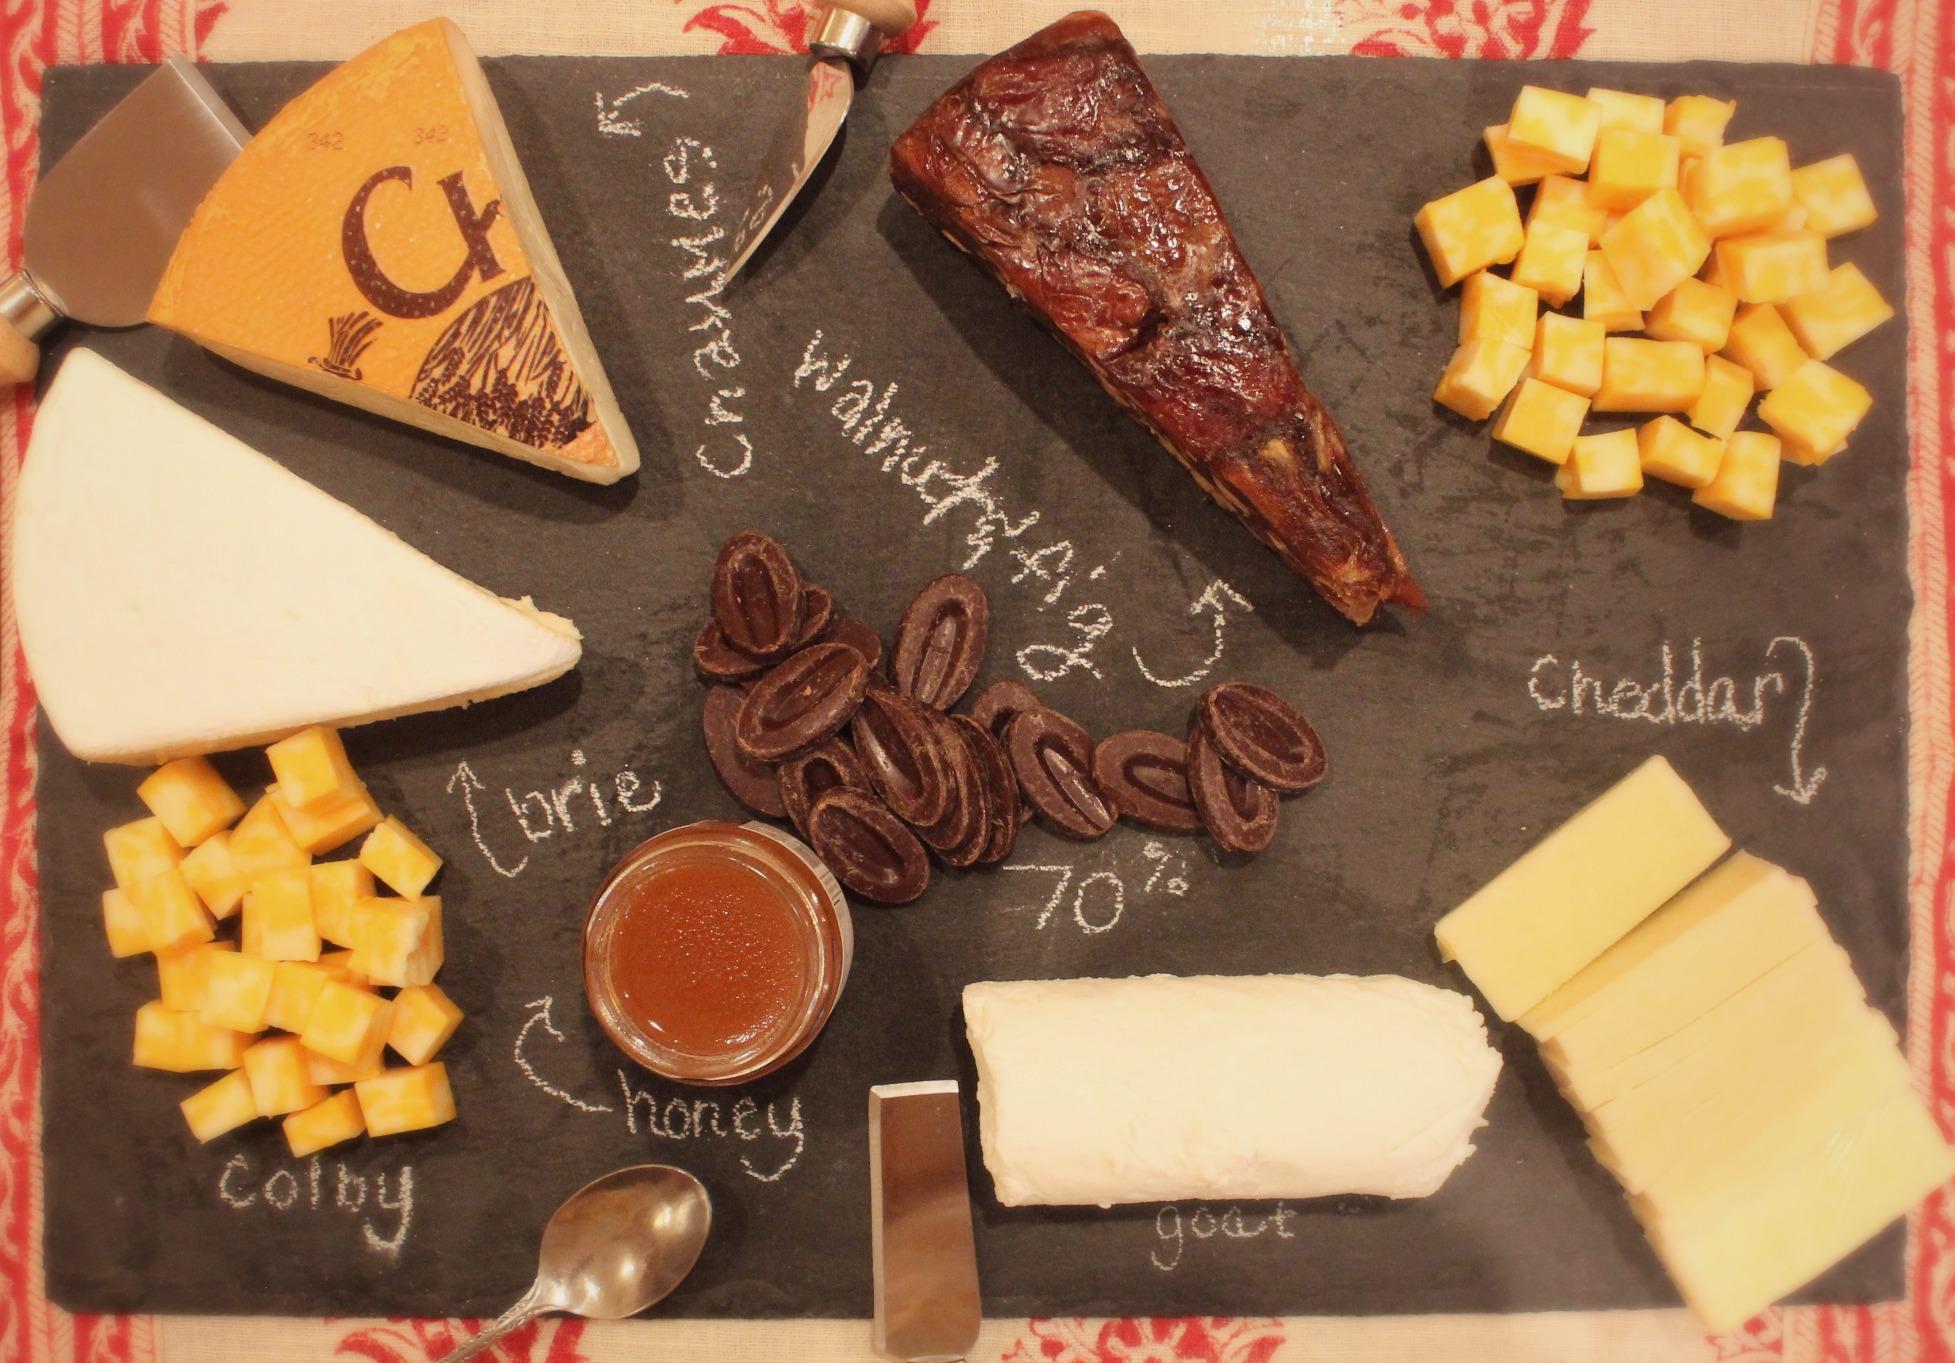 Easy DIY Cheese PlatterA Lavender Heart & How To Make a Cheese Platter \u2013 Recipesbnb